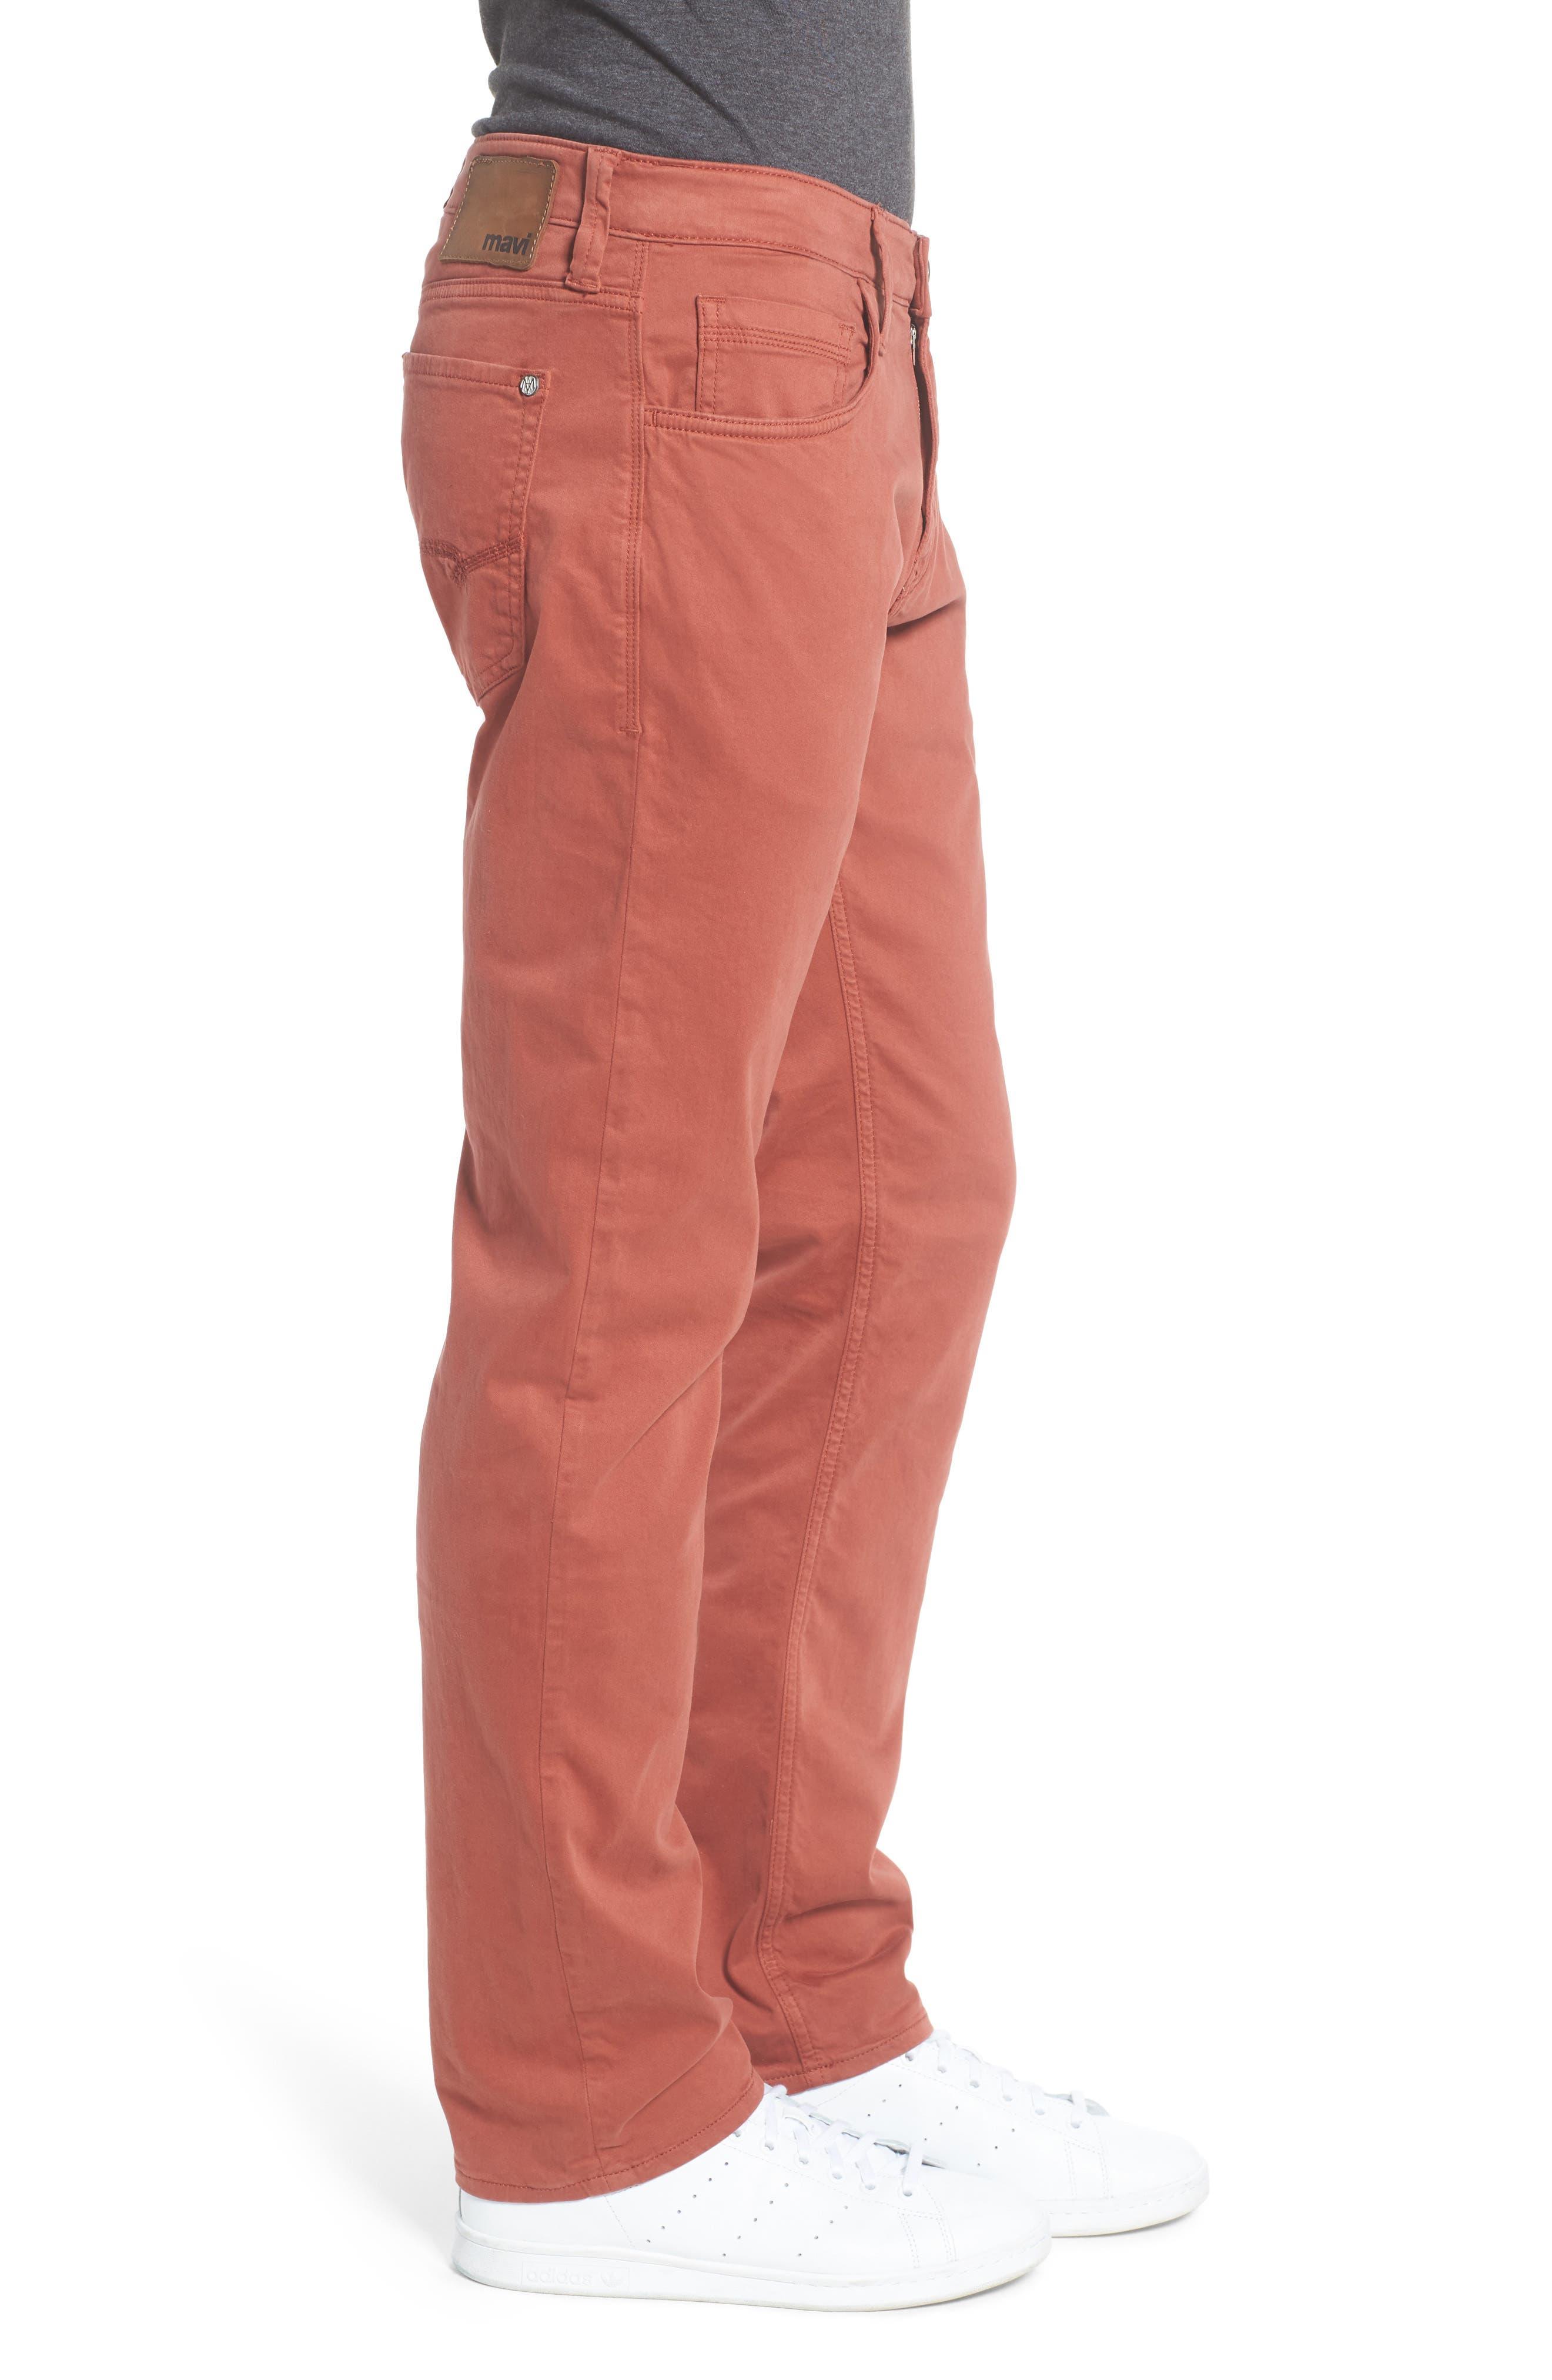 Zach Straight Leg Jeans,                             Alternate thumbnail 3, color,                             600